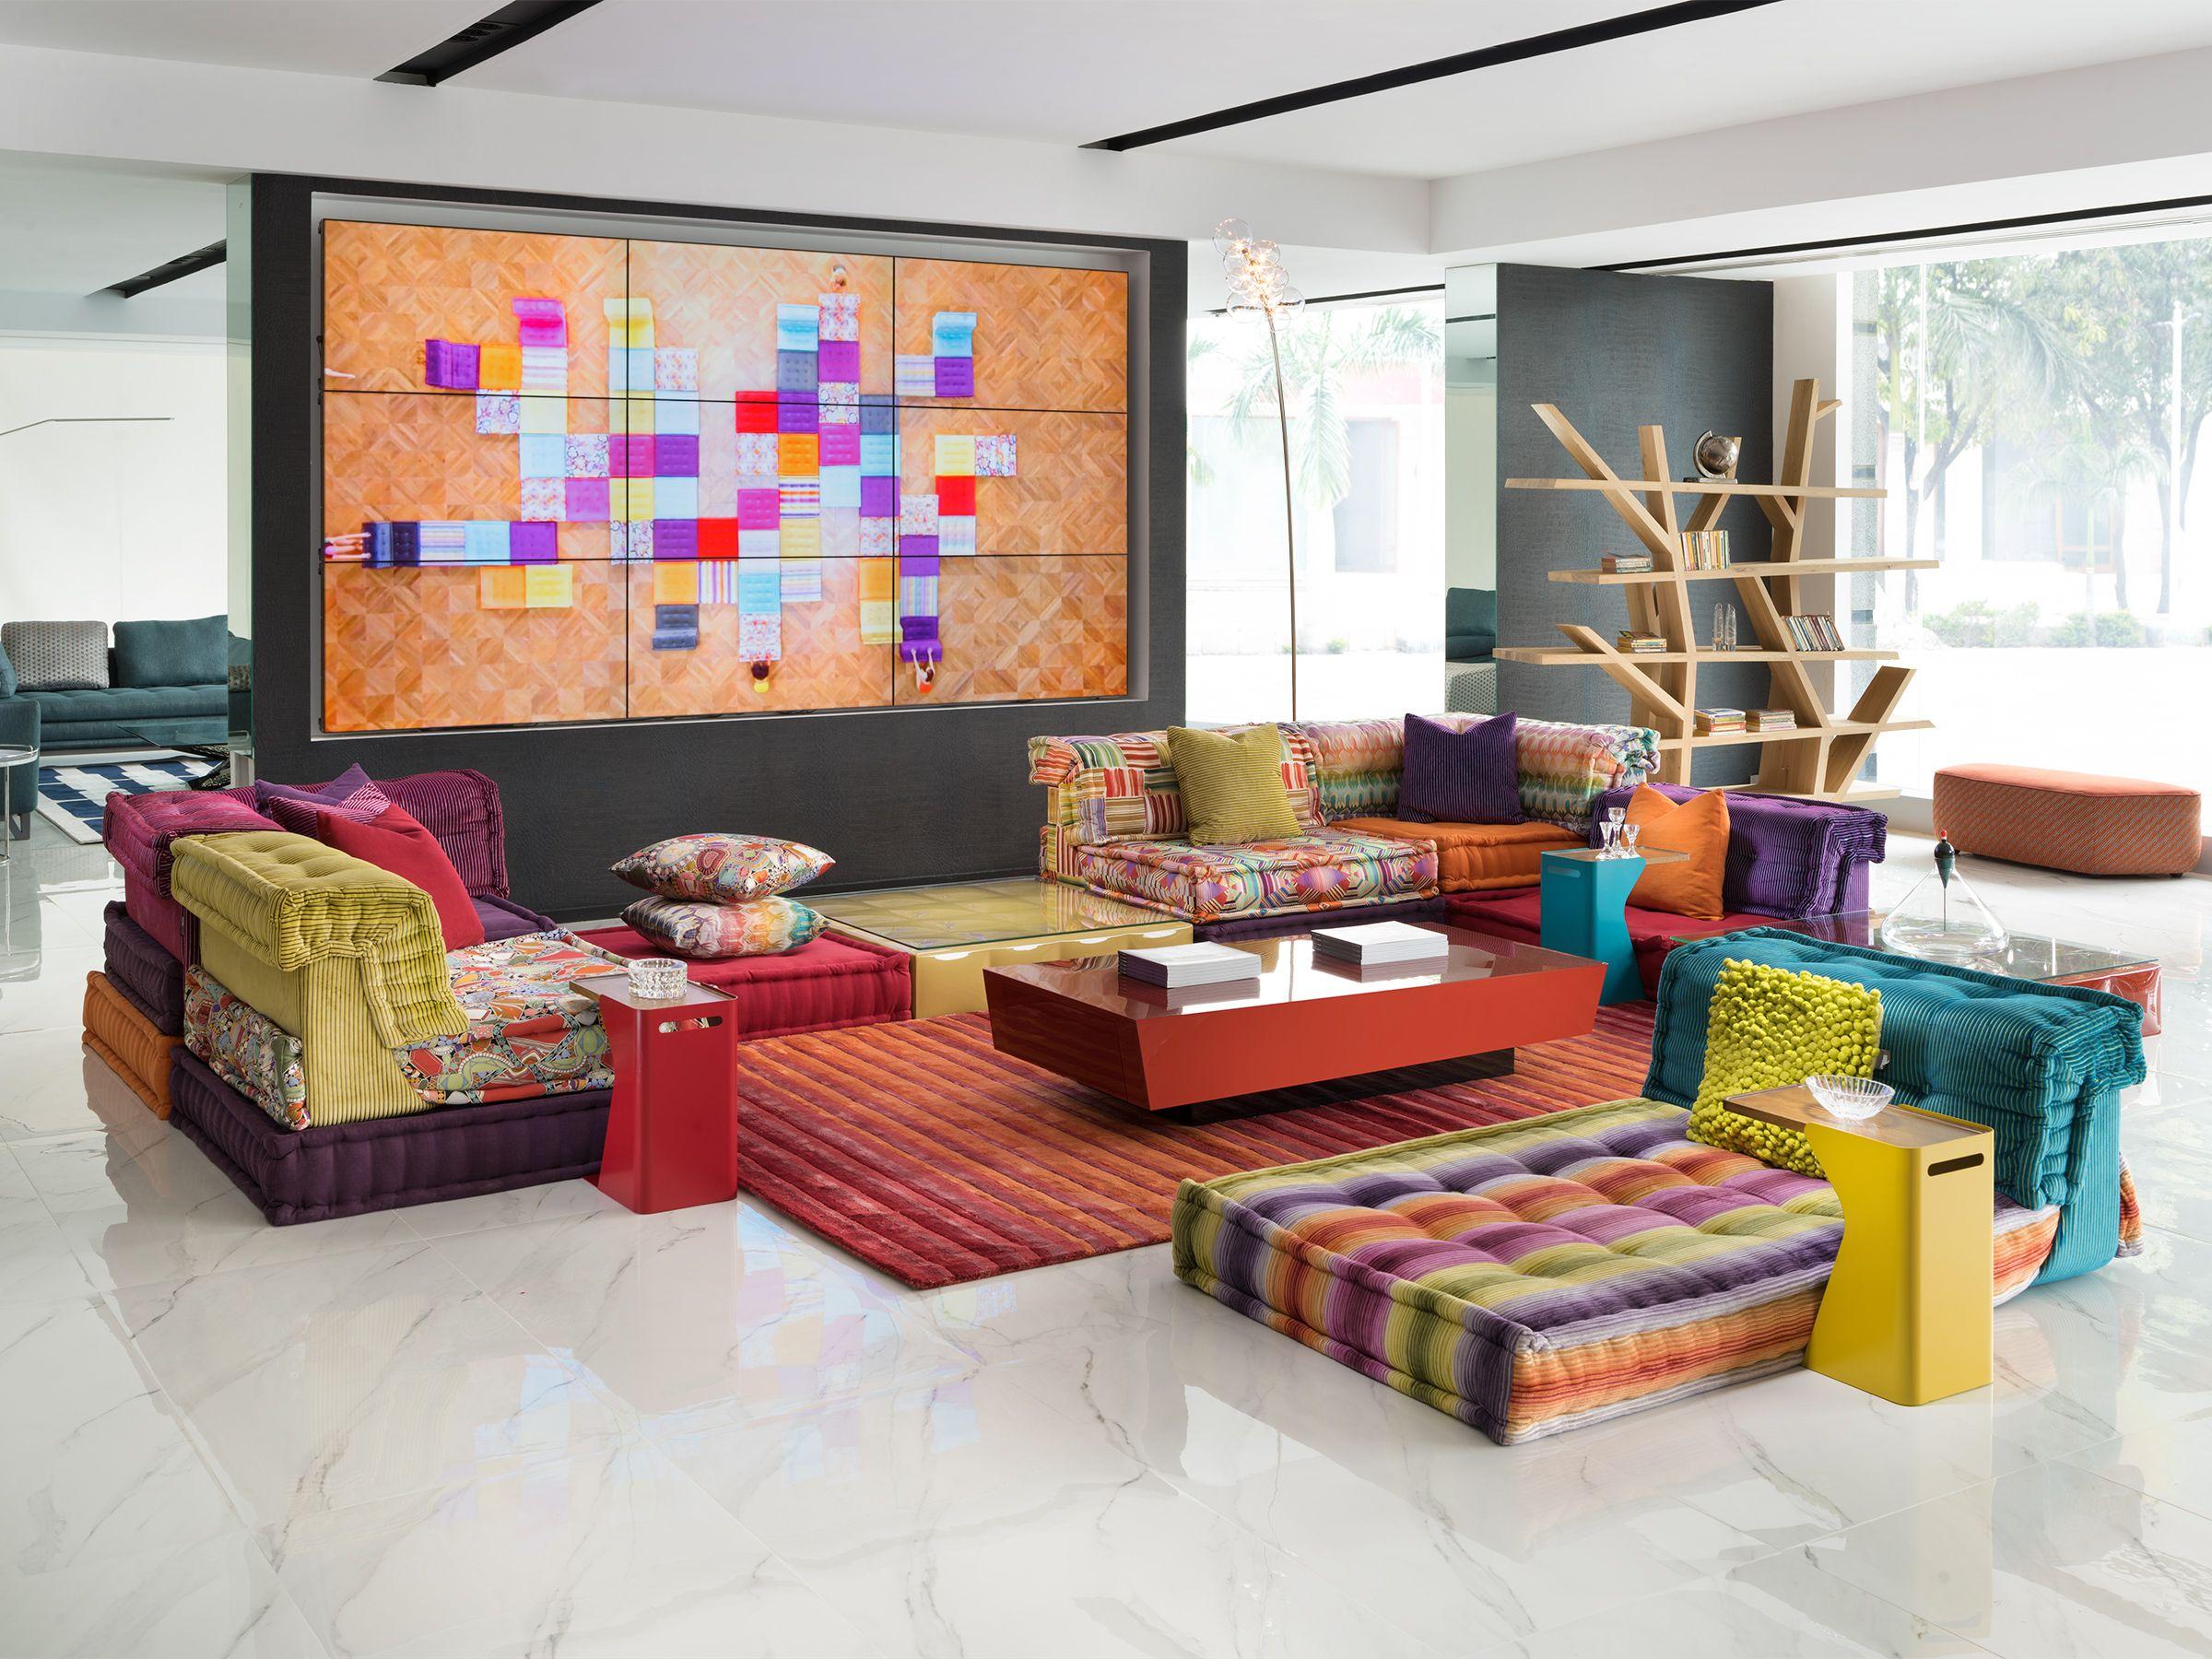 Roche Bobois New Delhi India Mah Jong Sofa Showroom Display